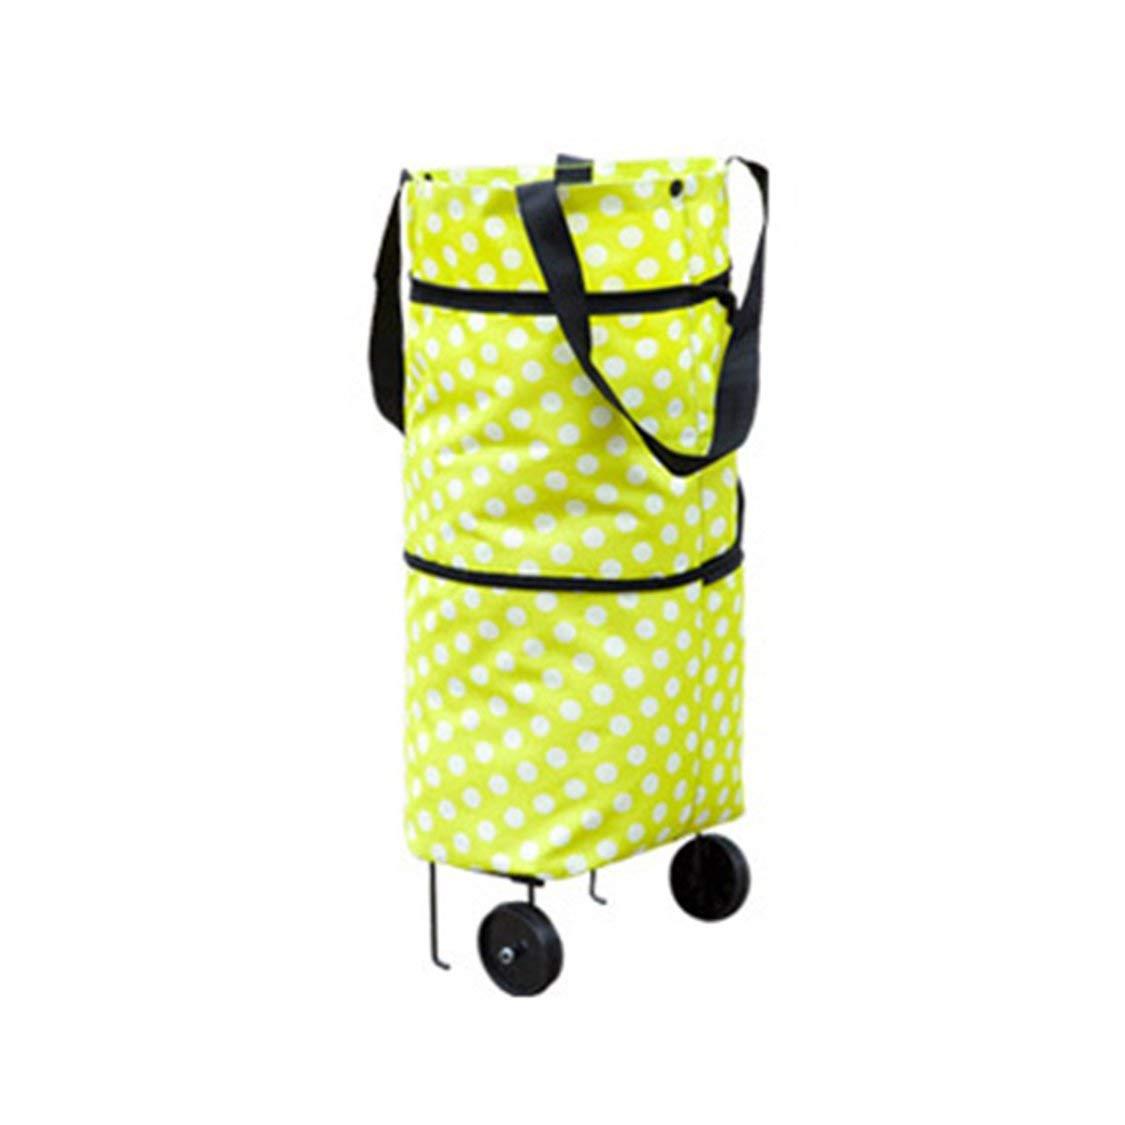 Fashionable Design Large Capacity Waterproof Oxford Cloth Foldable Shopping Trolley Wheel Bag Traval Cart Luggage Bag